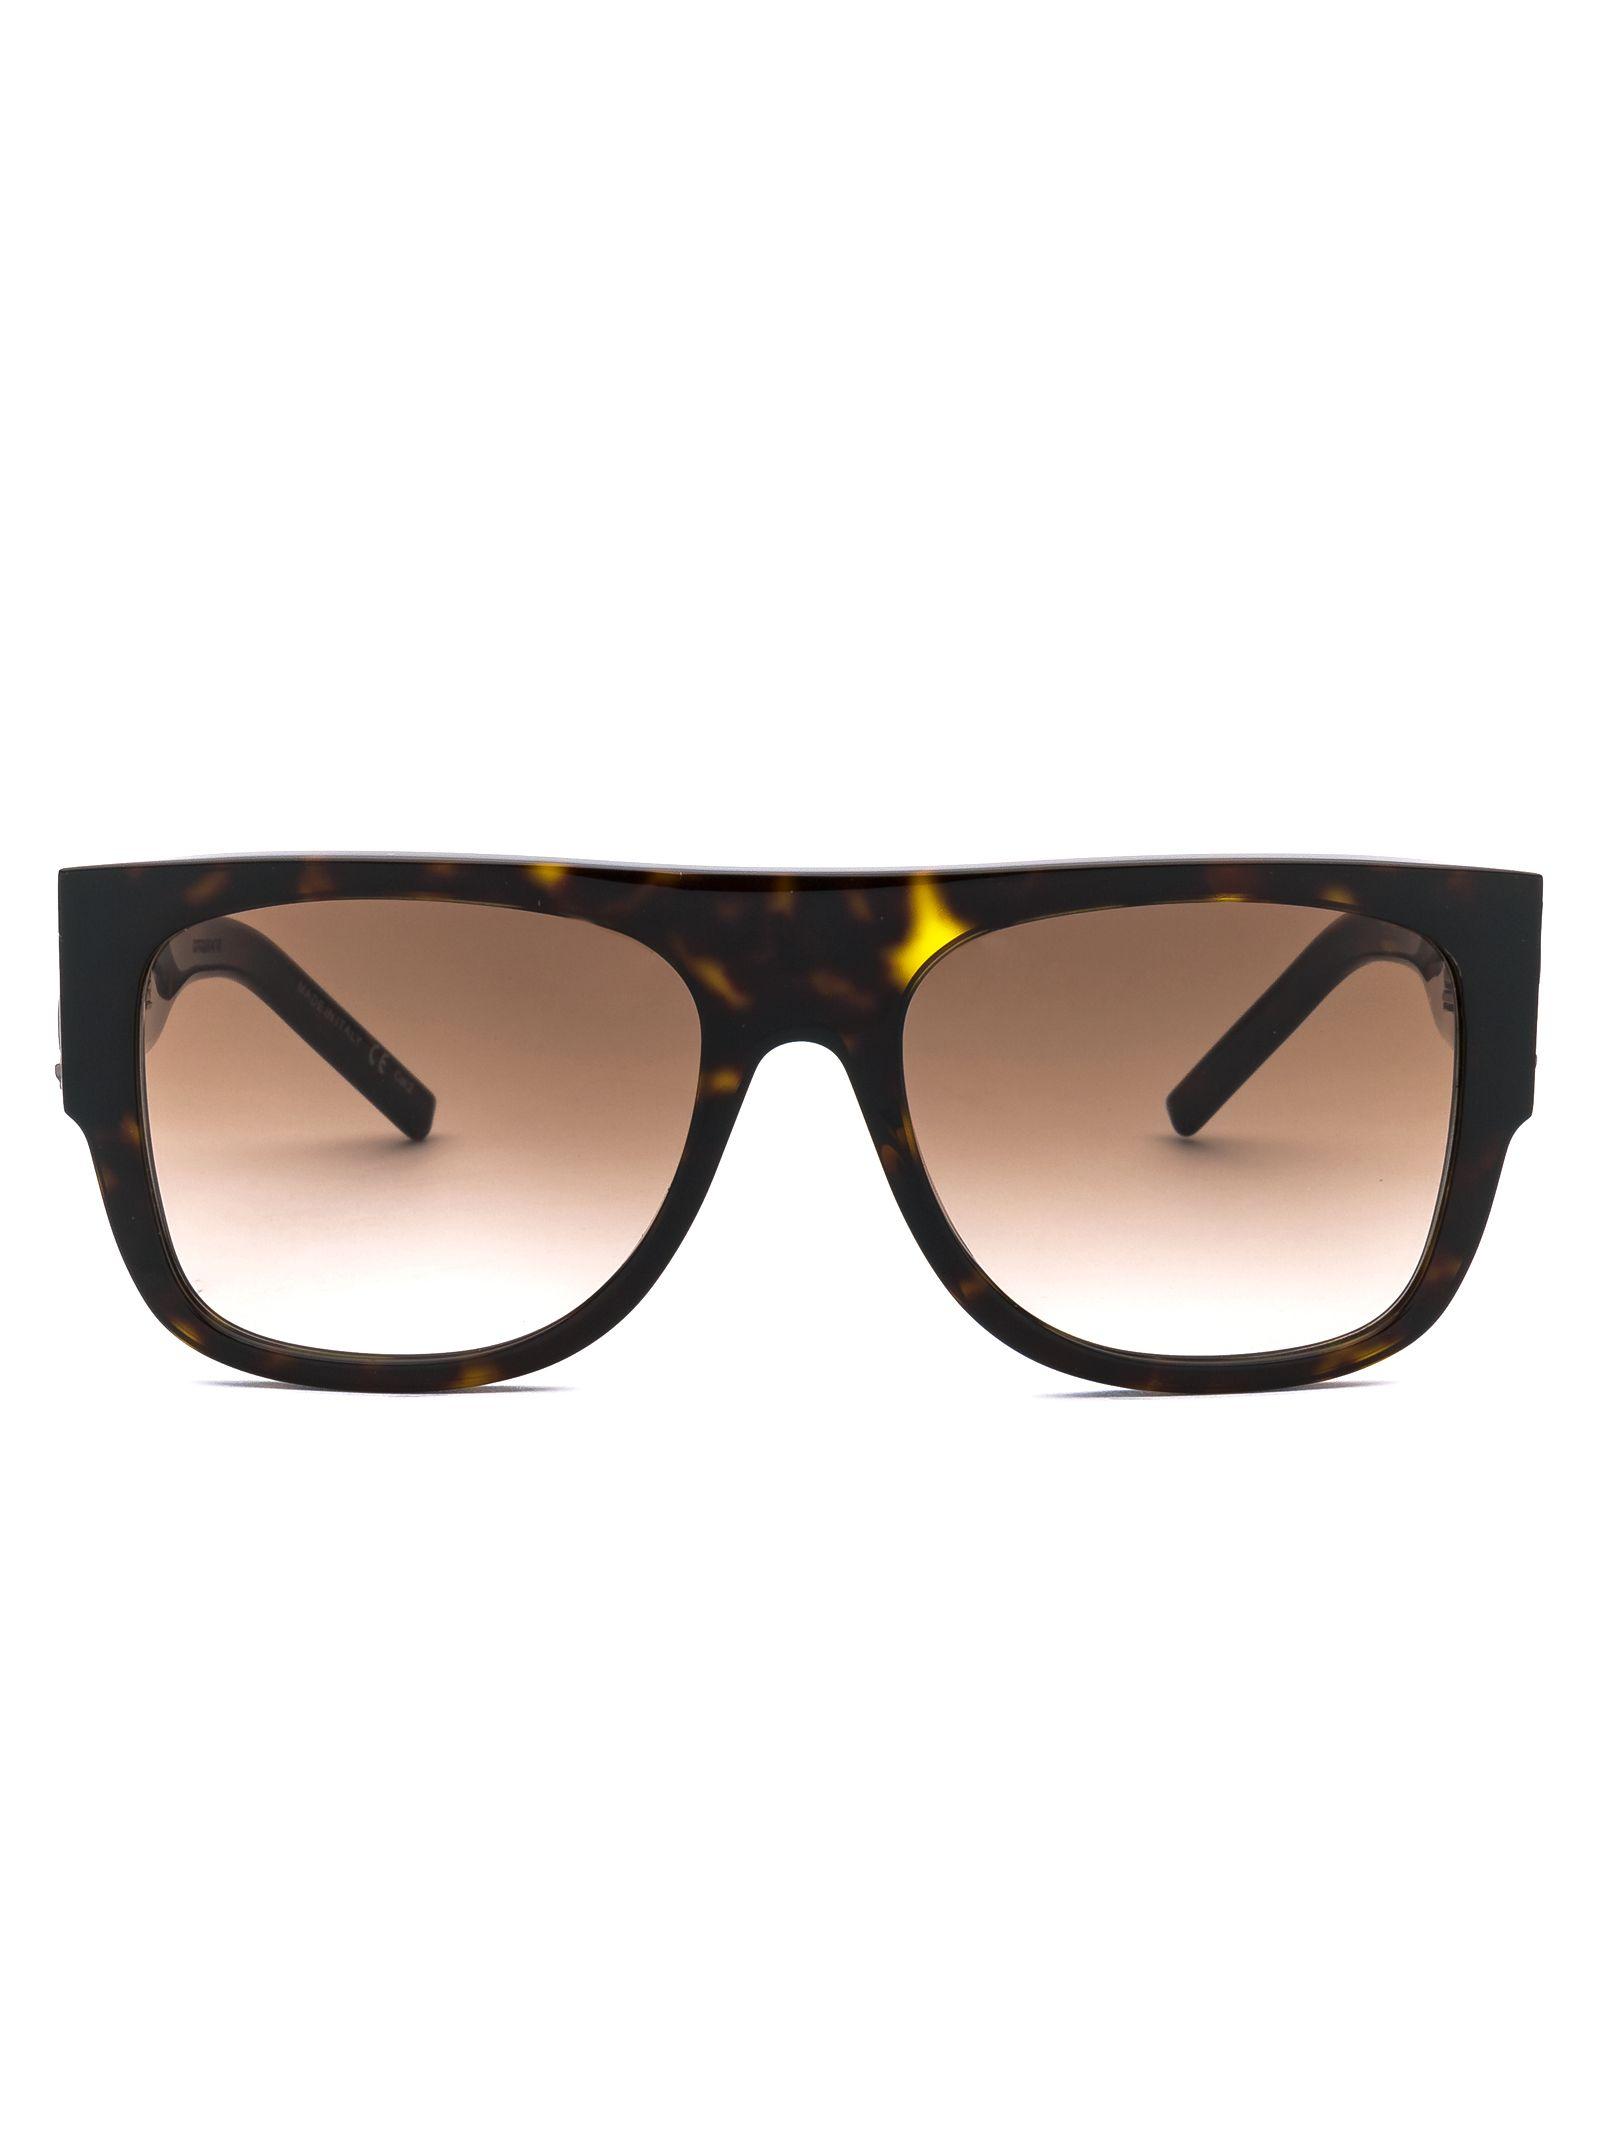 Saint Laurent Slm-16 Sunglasses